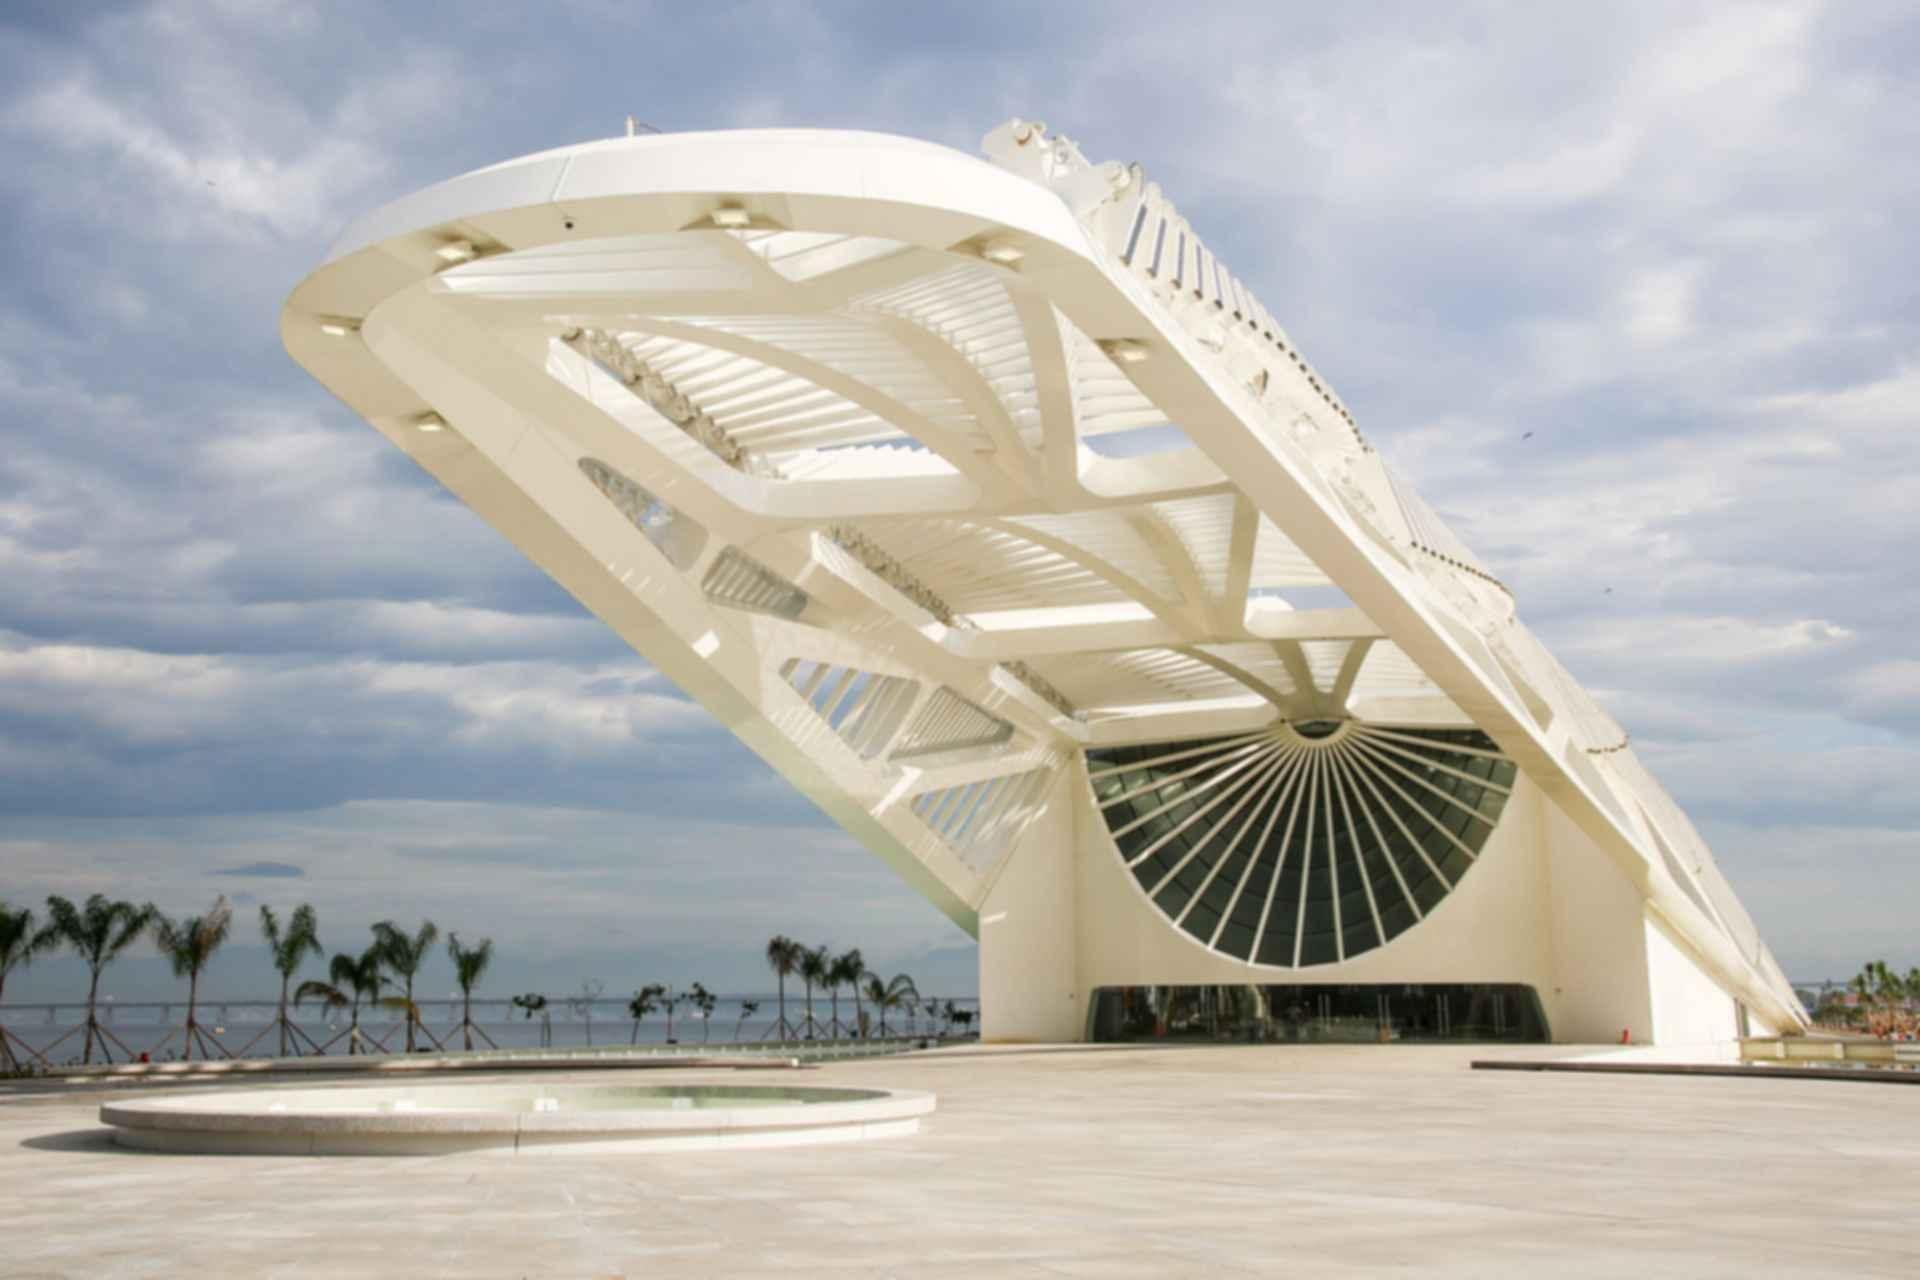 Museum of Tomorrow - Detailing